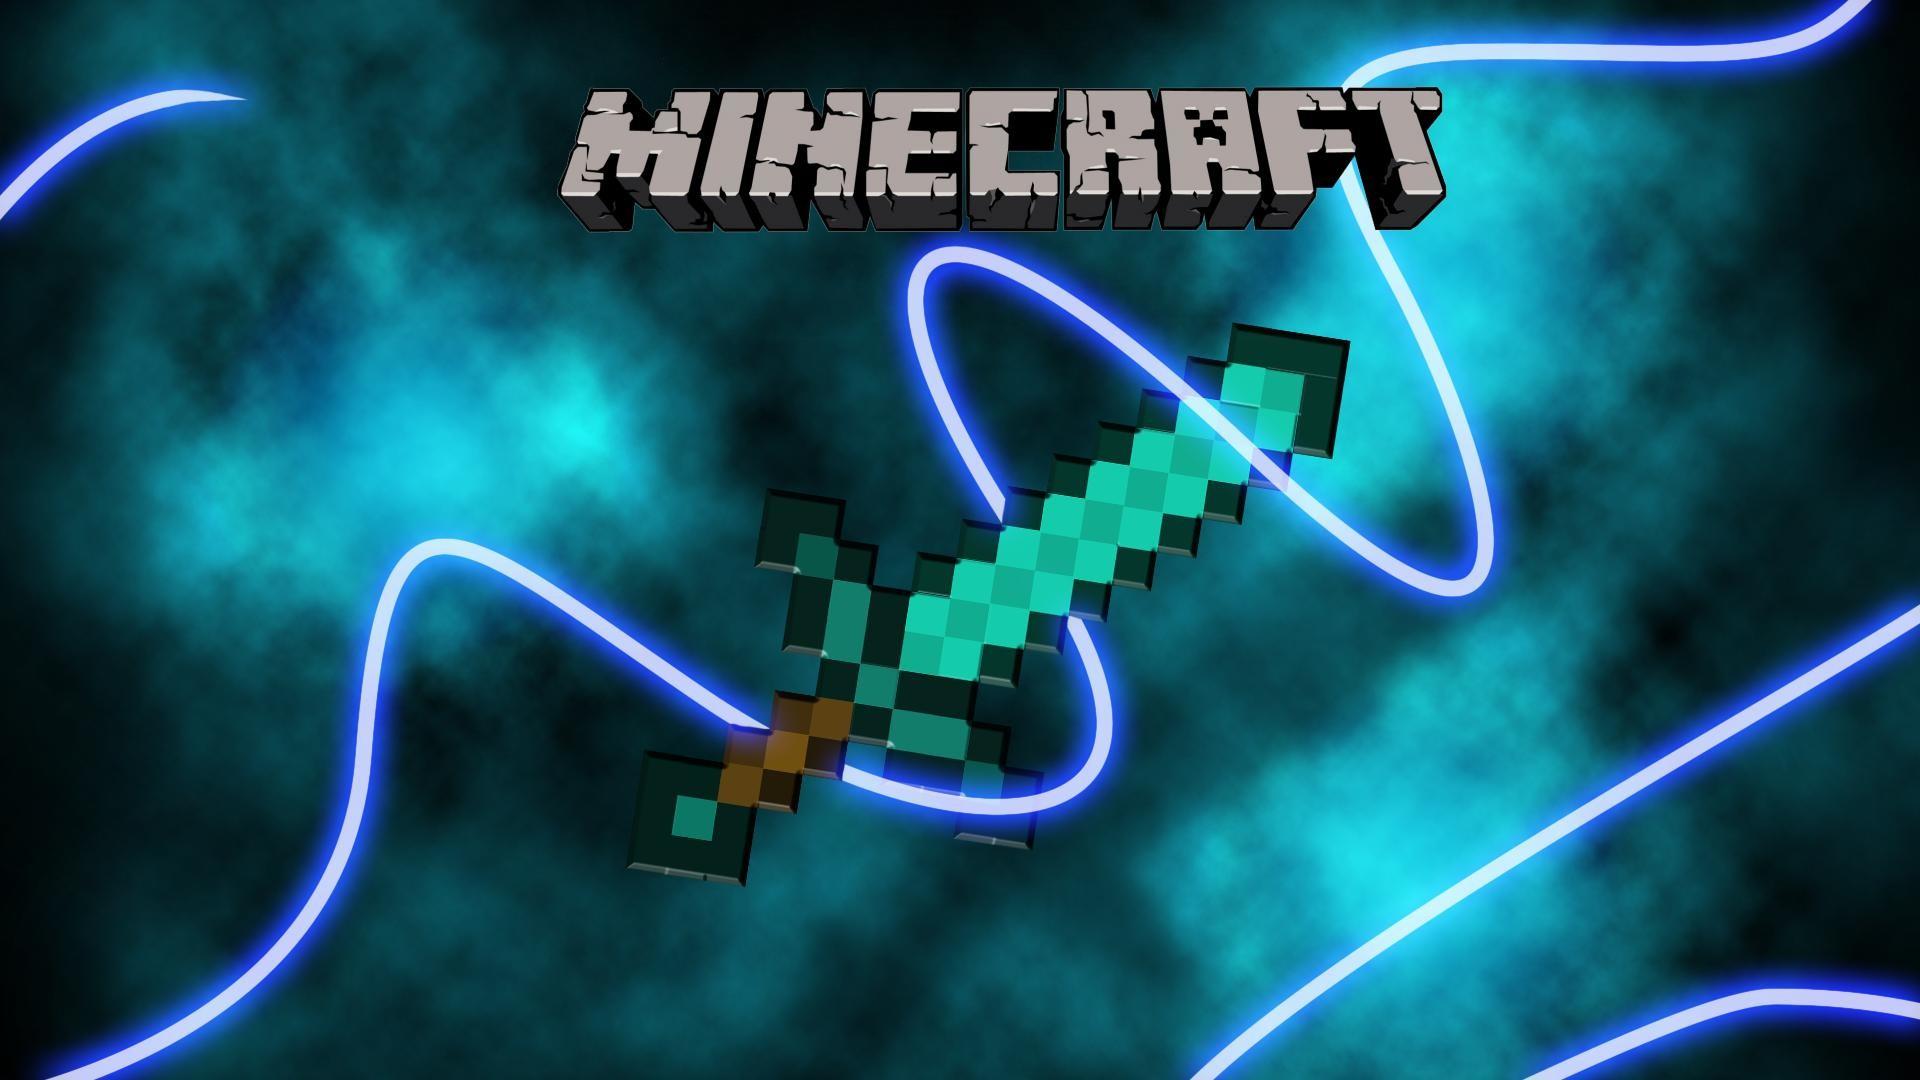 Zendha Creeper Blue Minecraft Wallpaper